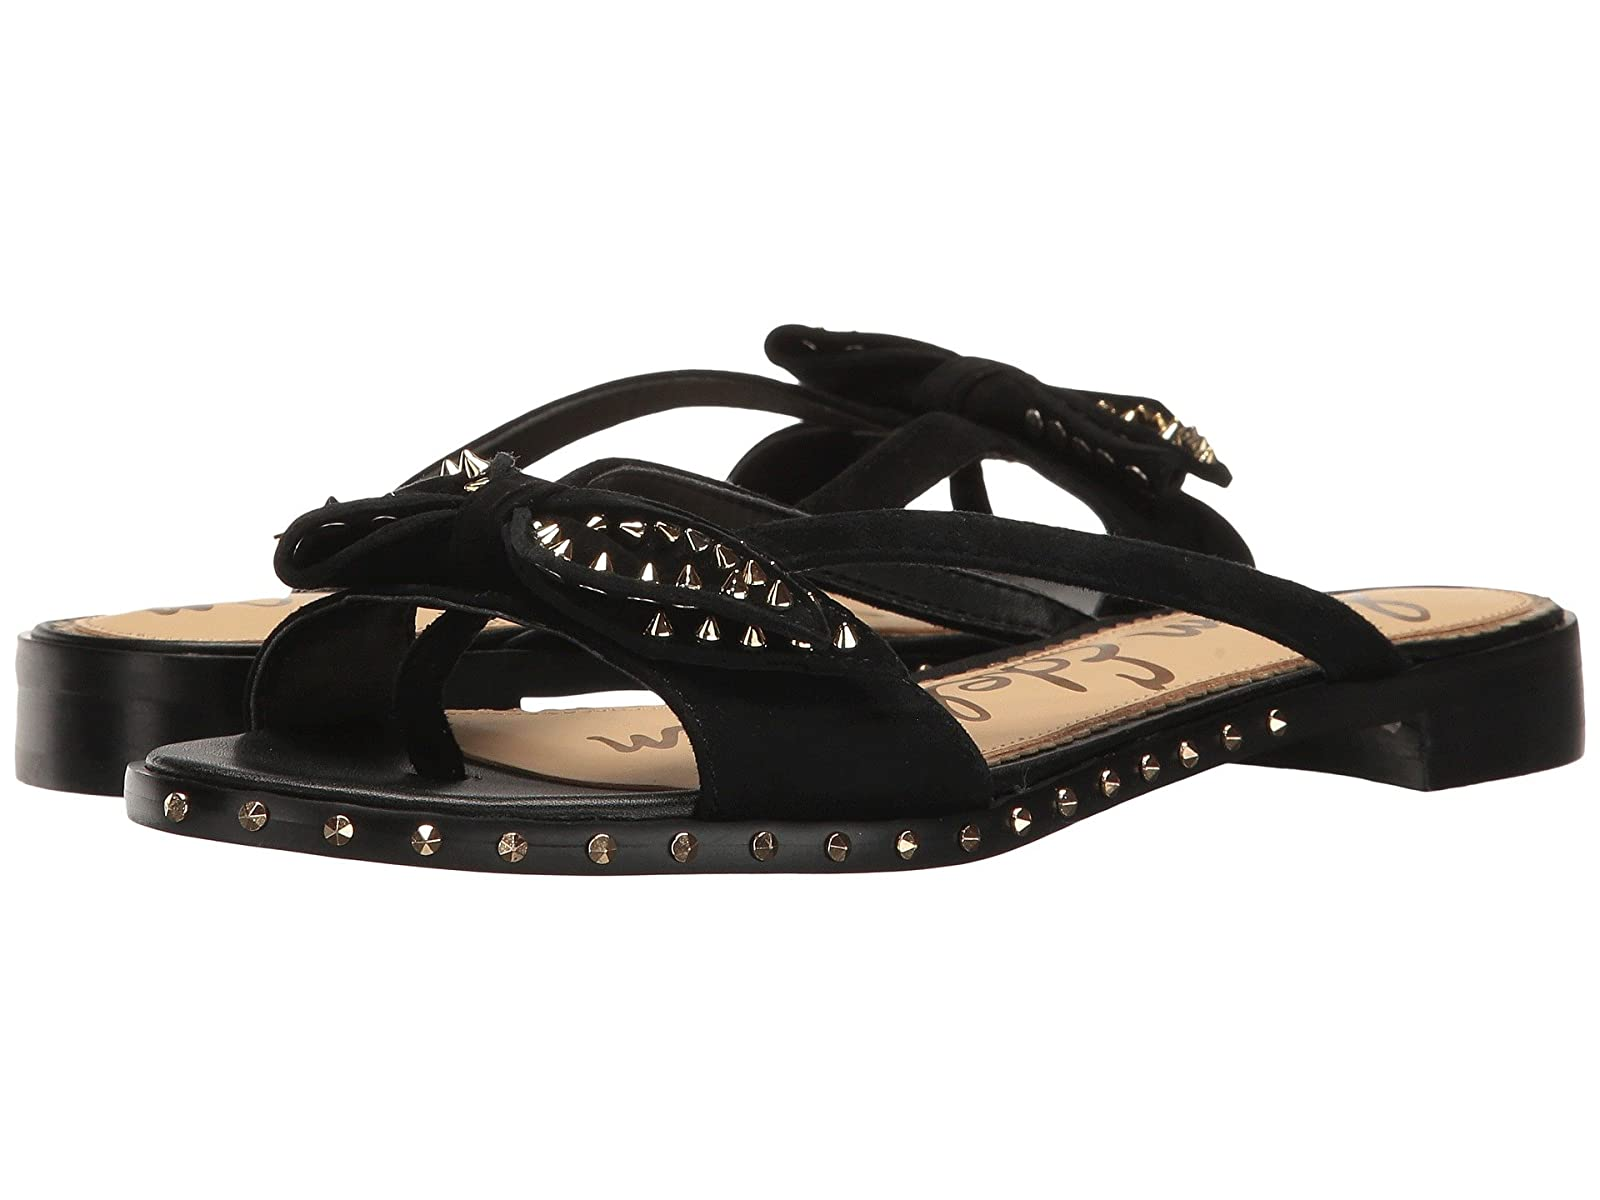 Sam Edelman DarielCheap and distinctive eye-catching shoes